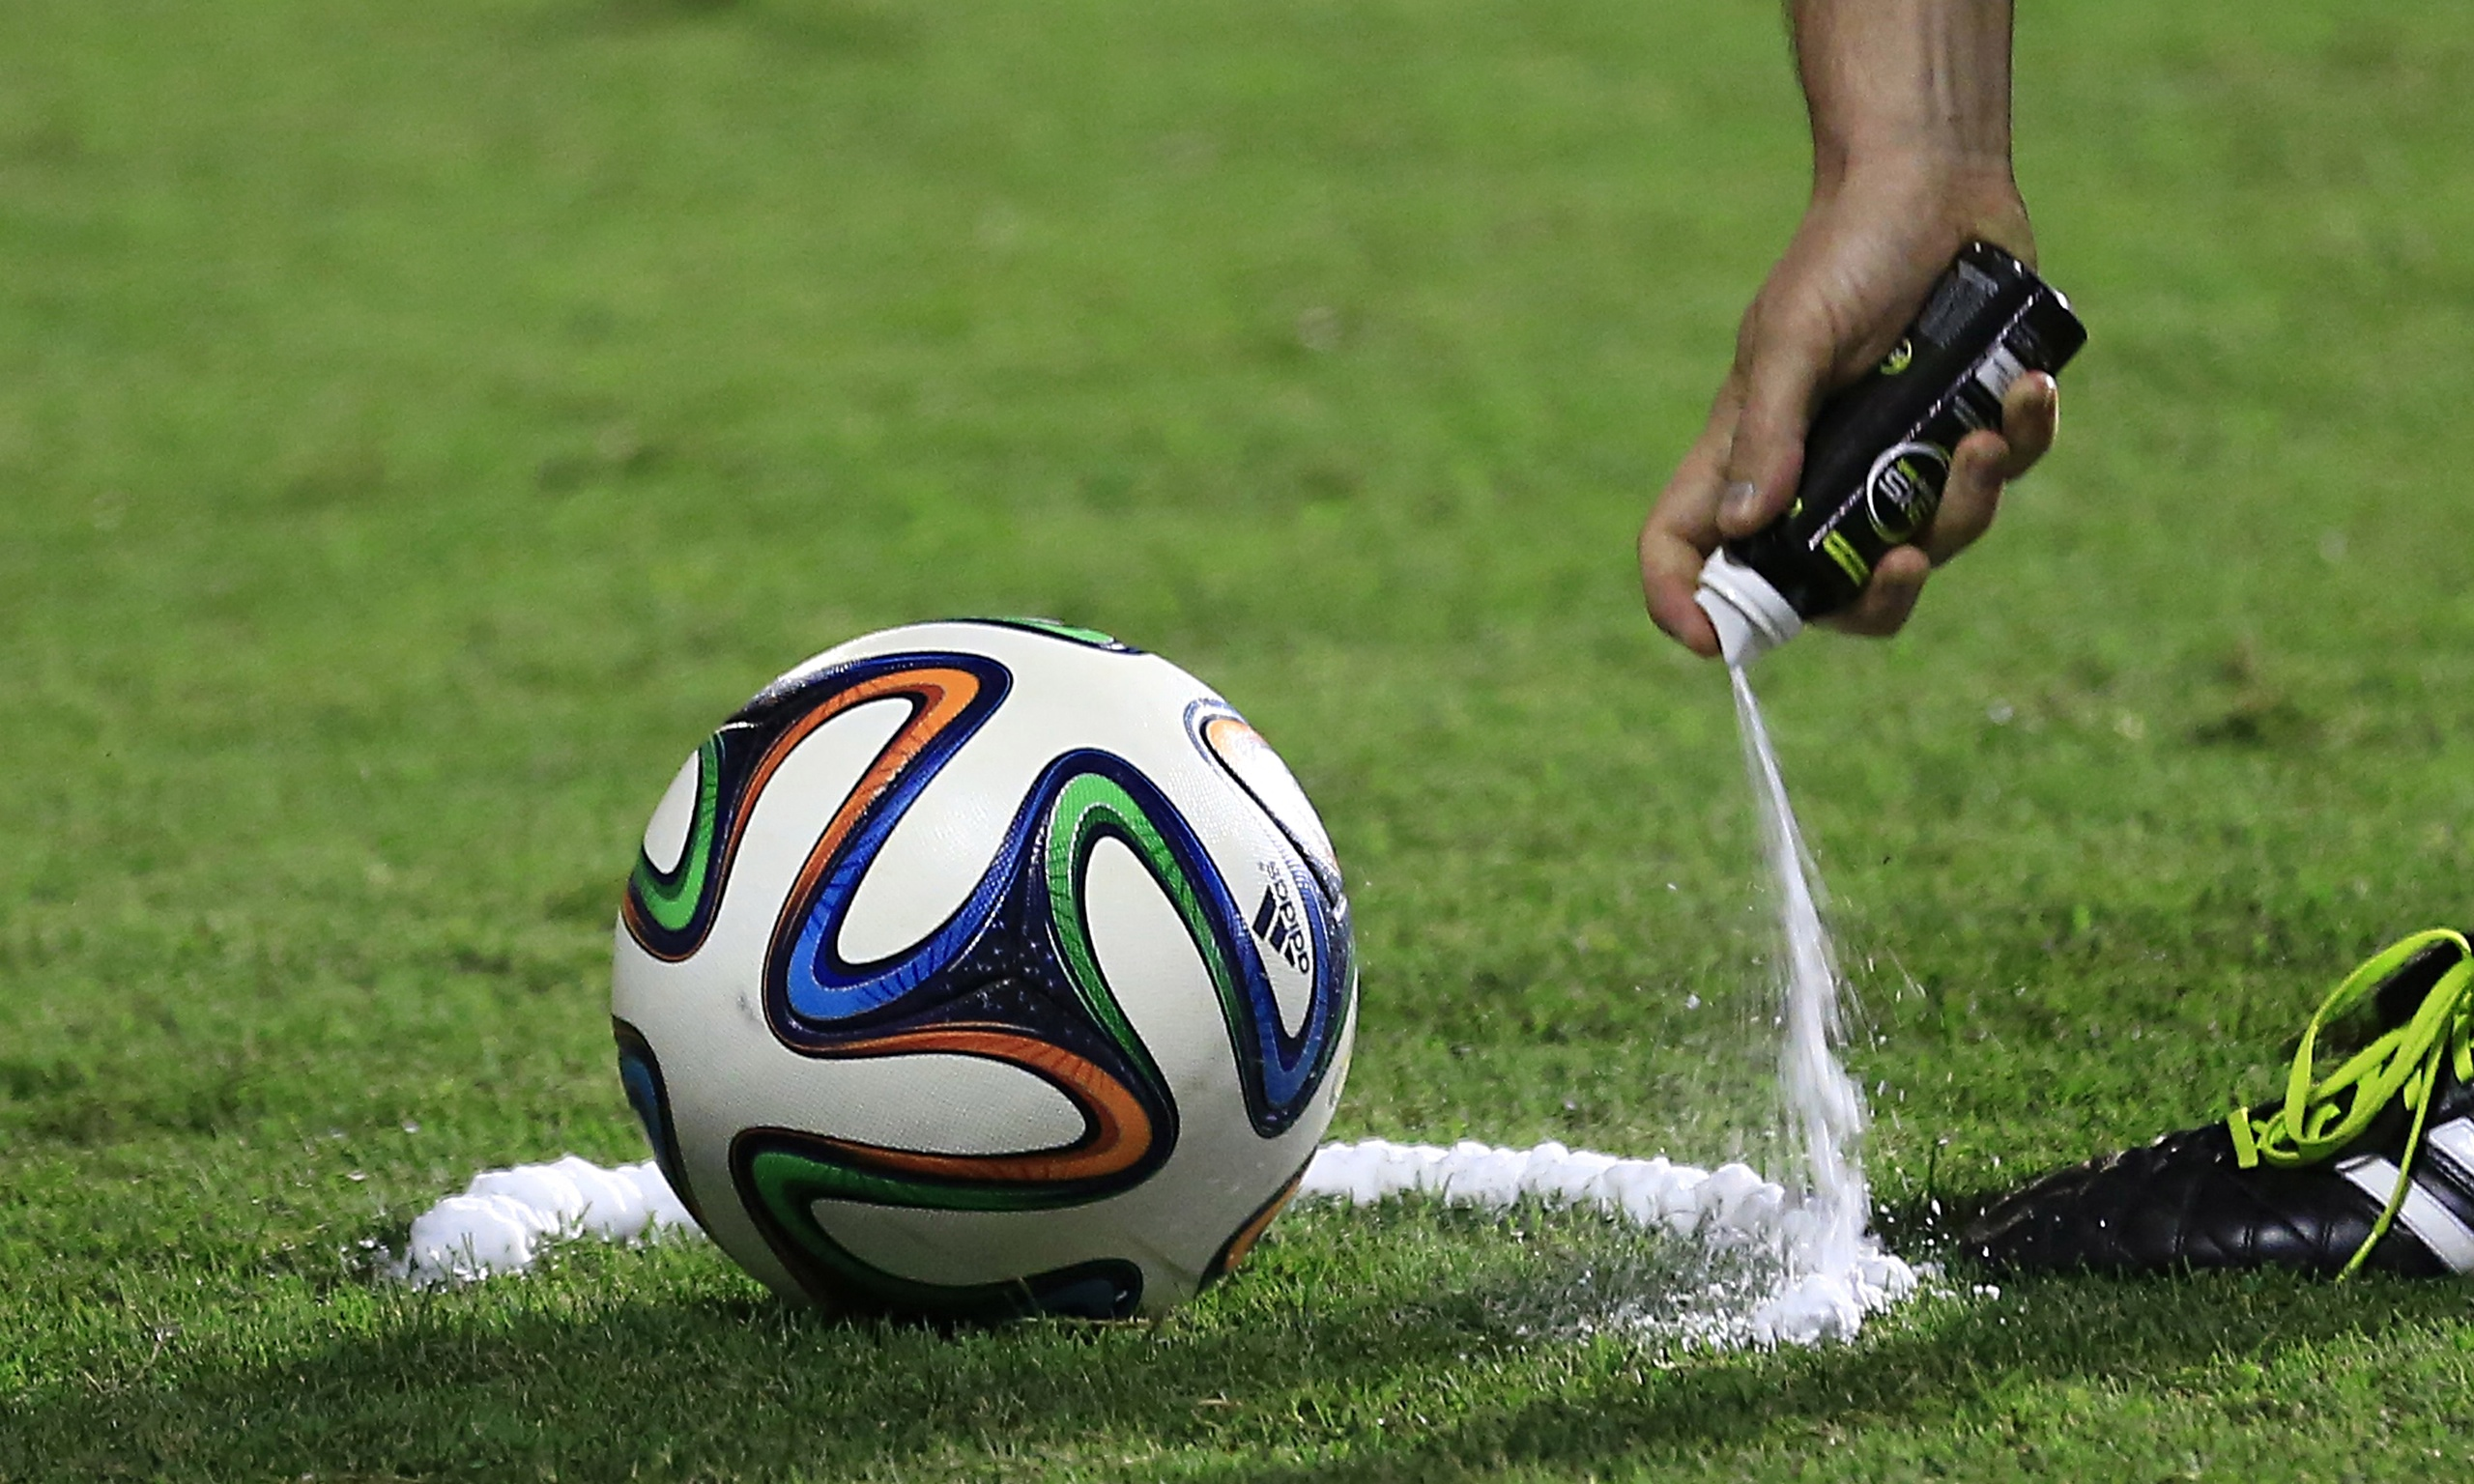 S Ray Football German inspectors say ...